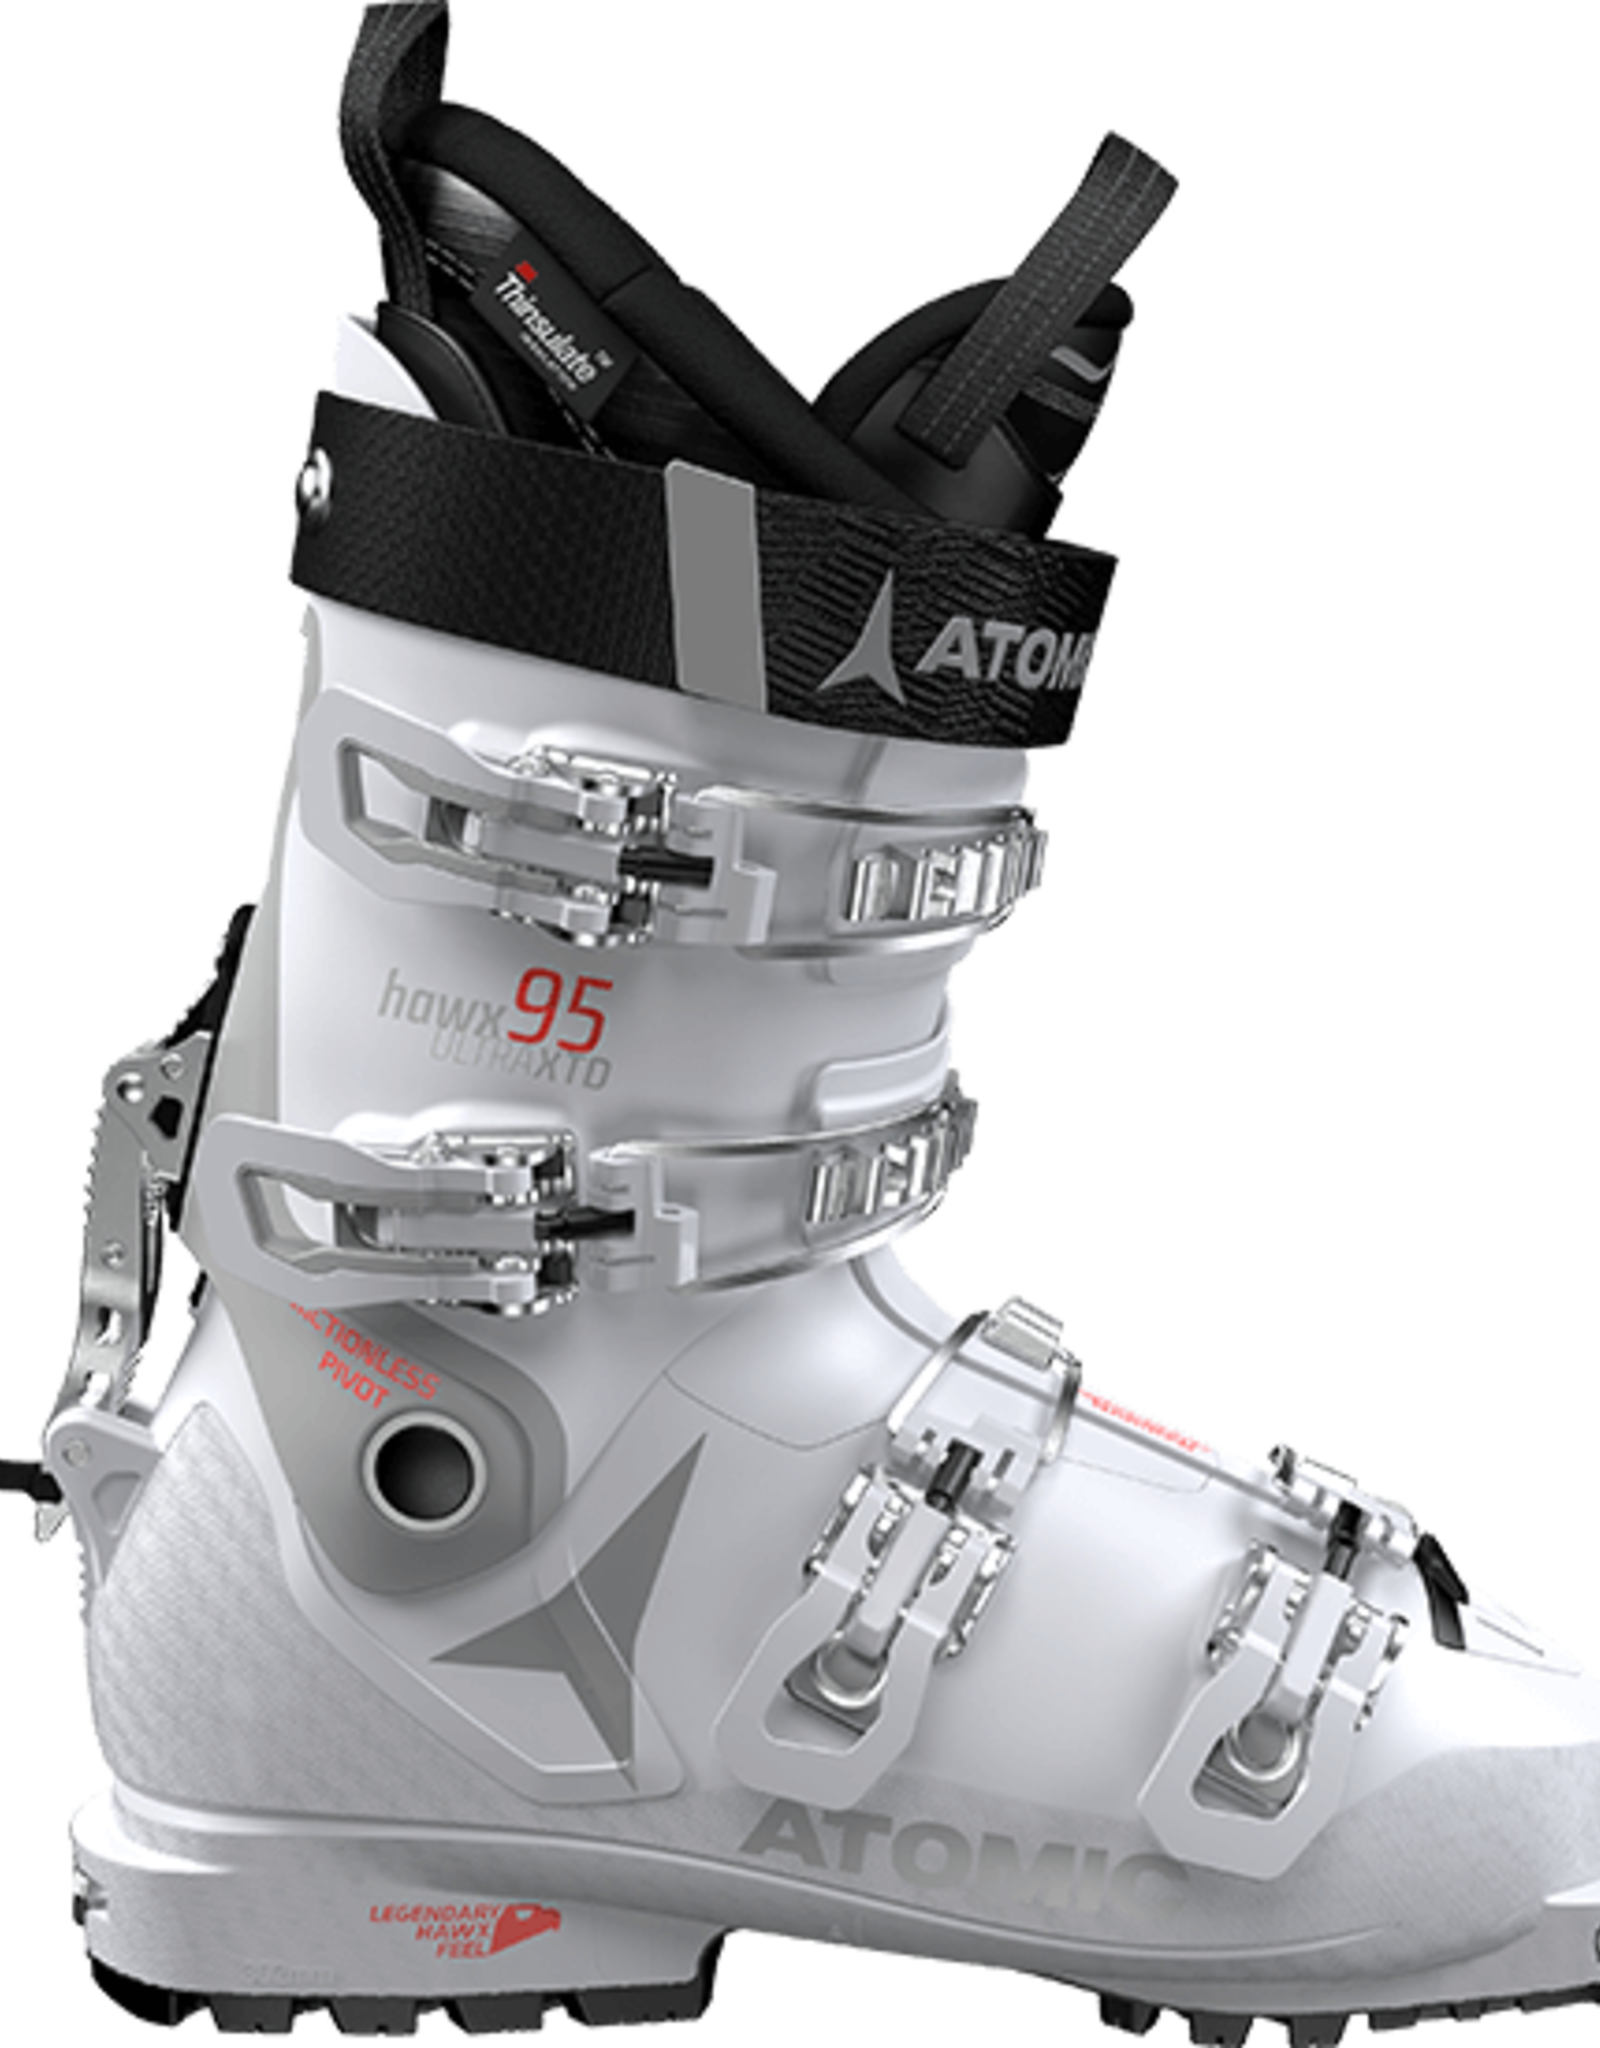 Atomic Hawx Ultra Xtd 95 W Tech GW Vapor/light -W2020